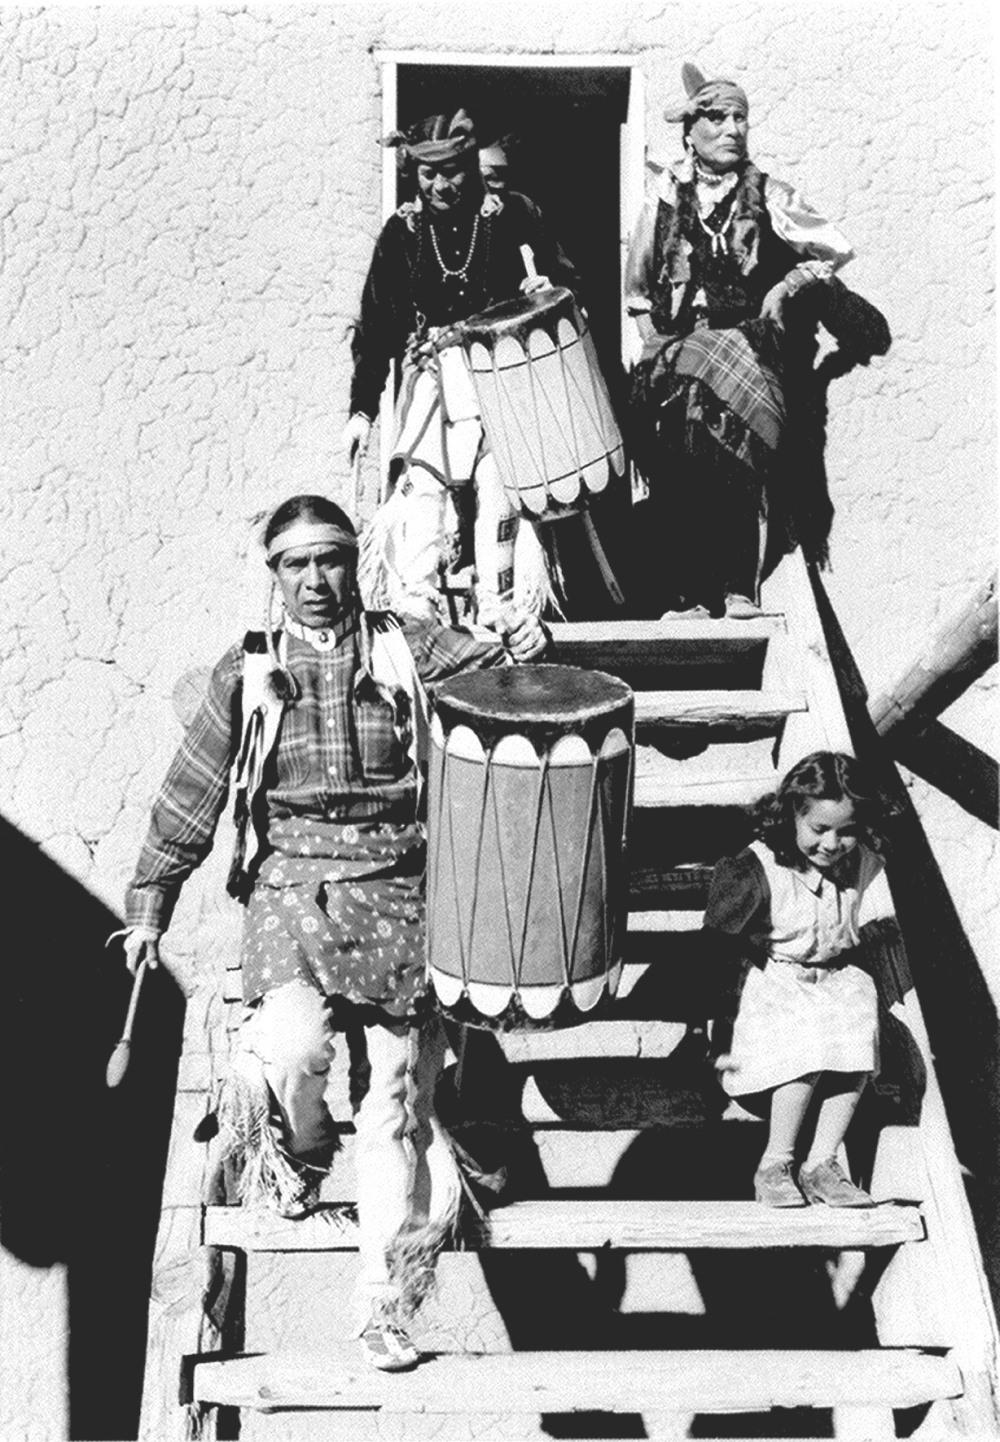 dance-san-ildefonso-pueblo-new-mexico-1942-ansel-adams